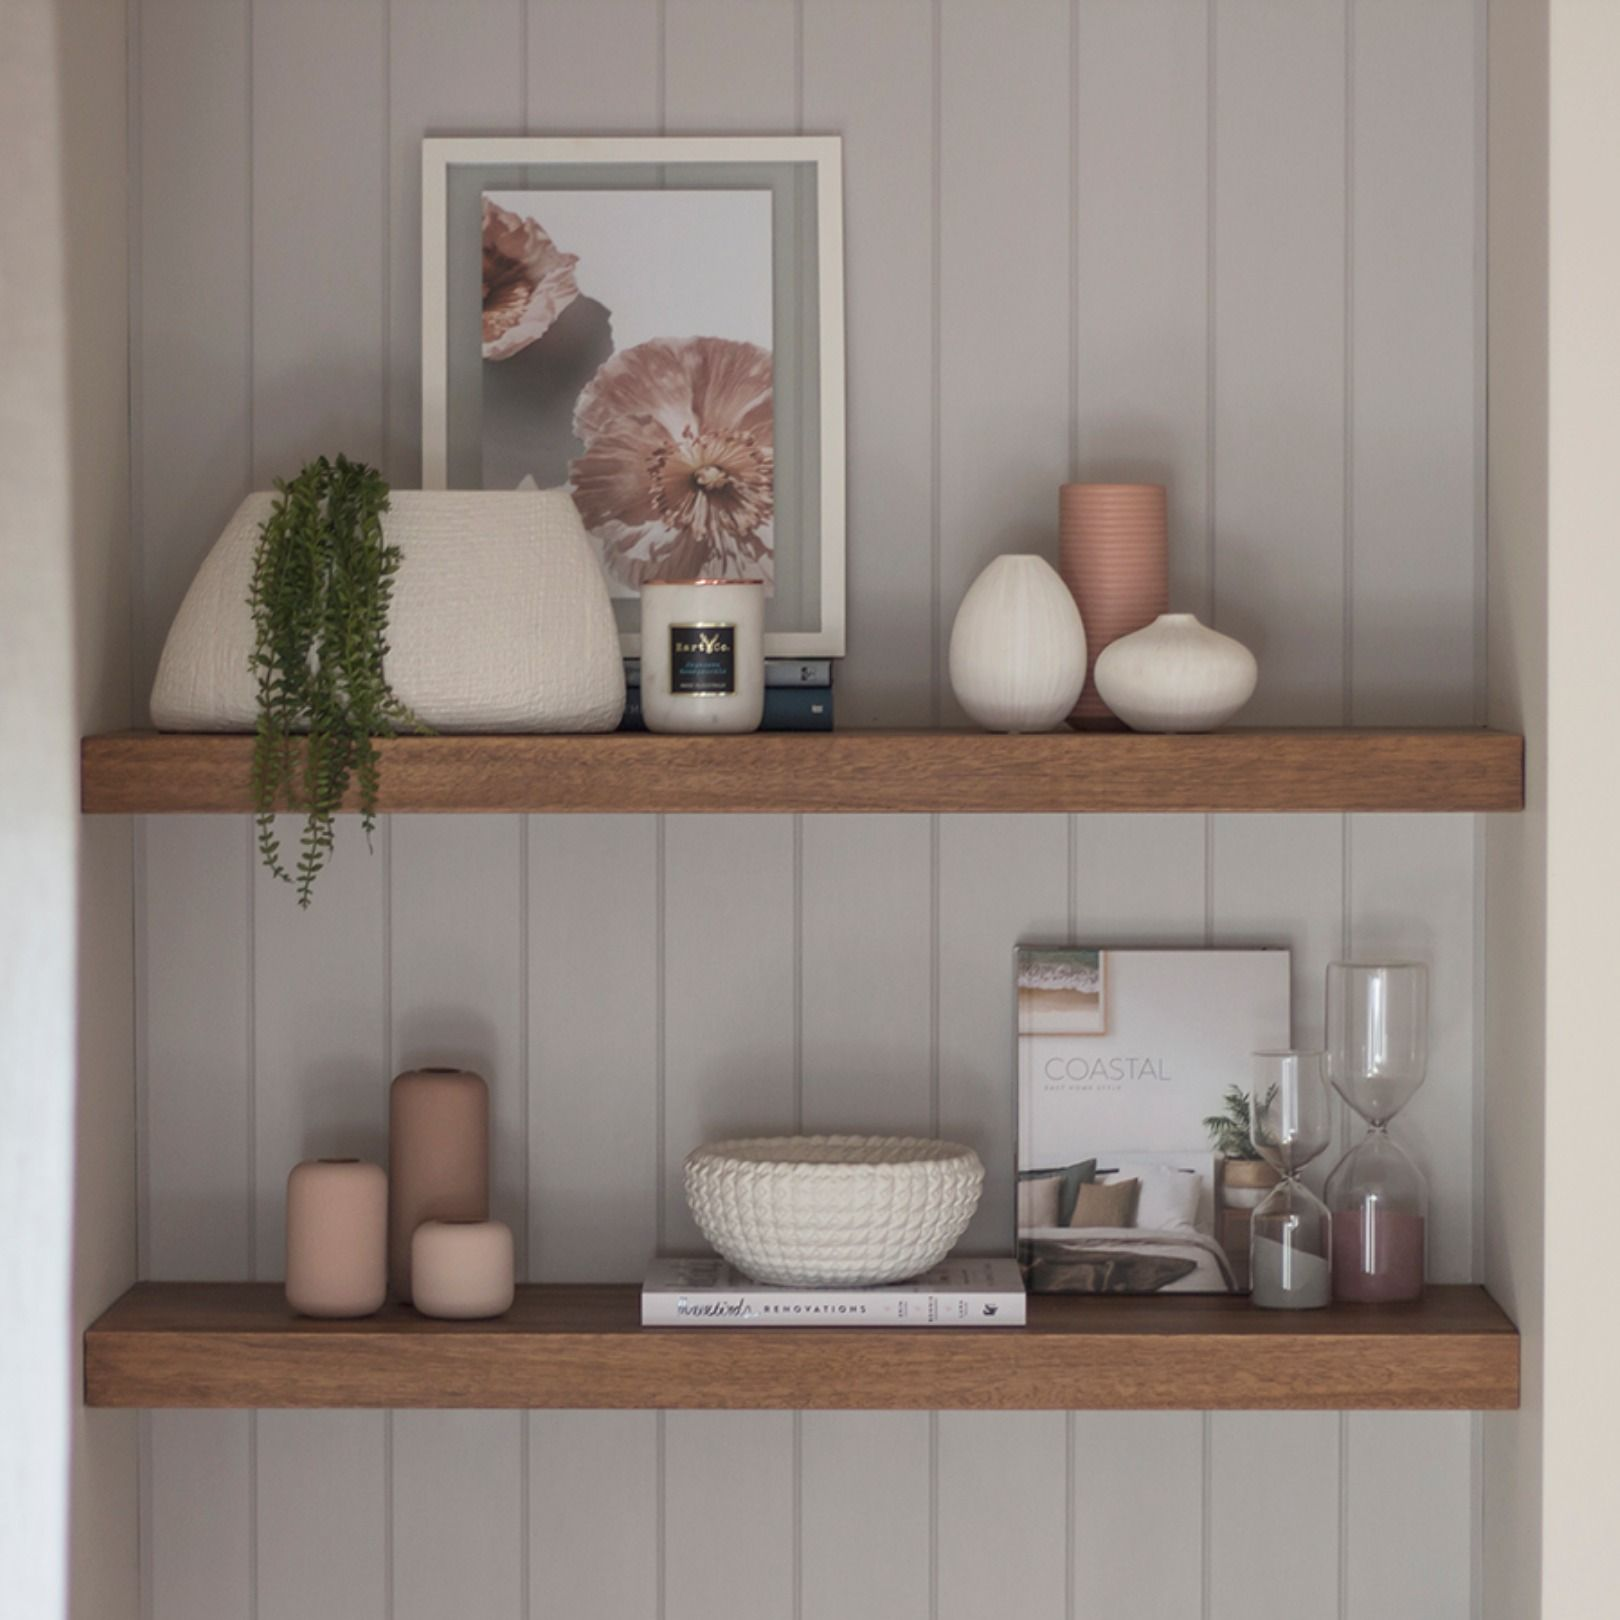 Shelfie How To Style A Shelf Home Decor House Styles Decor